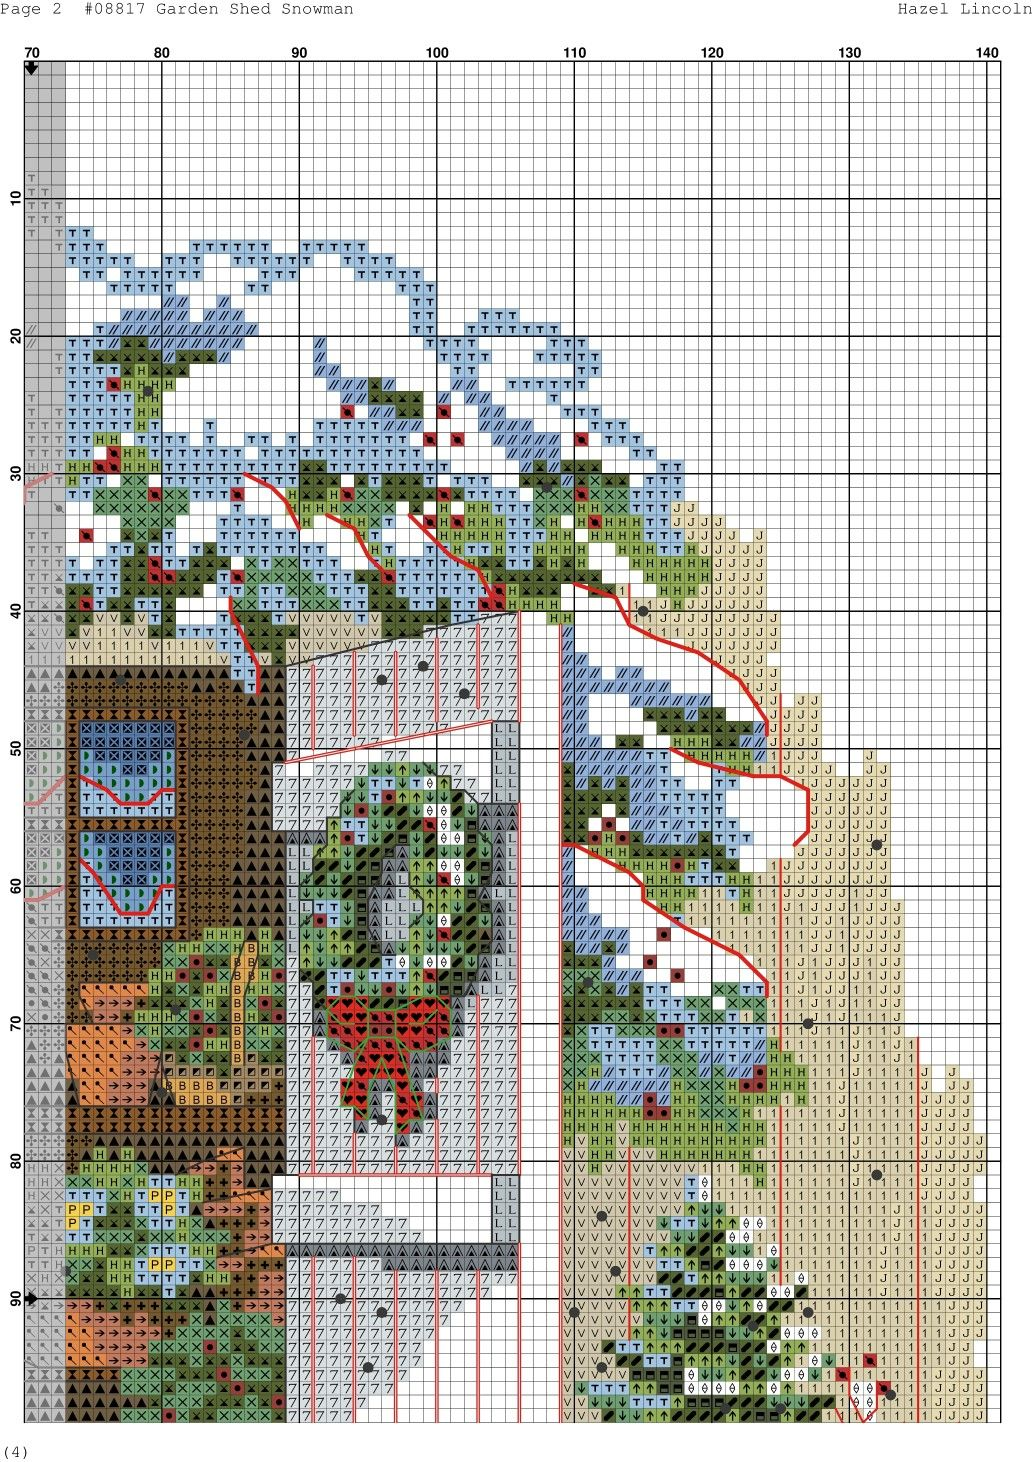 Garden Shed Snowman 2